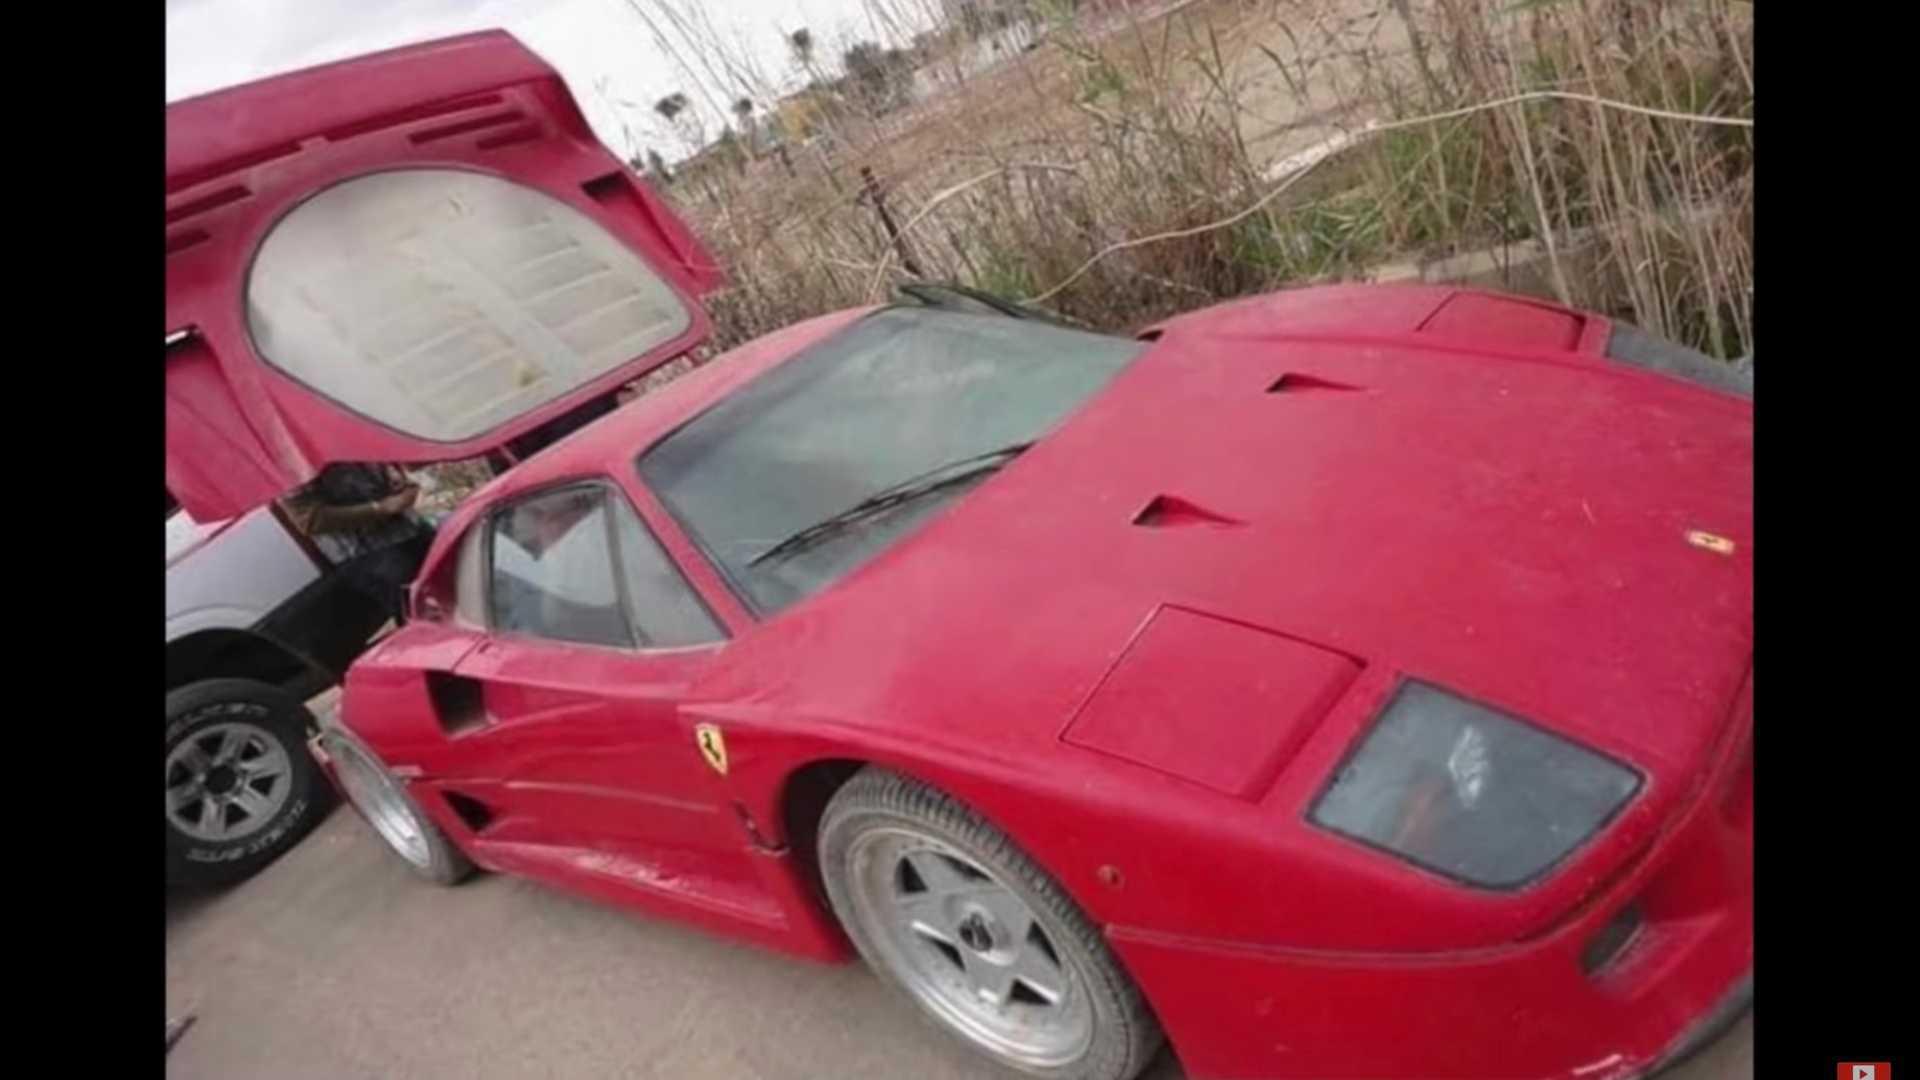 Ferrari F40 của con trai cố Tổng thống Sadam Hussein rao giá hơn 1 triệu USD